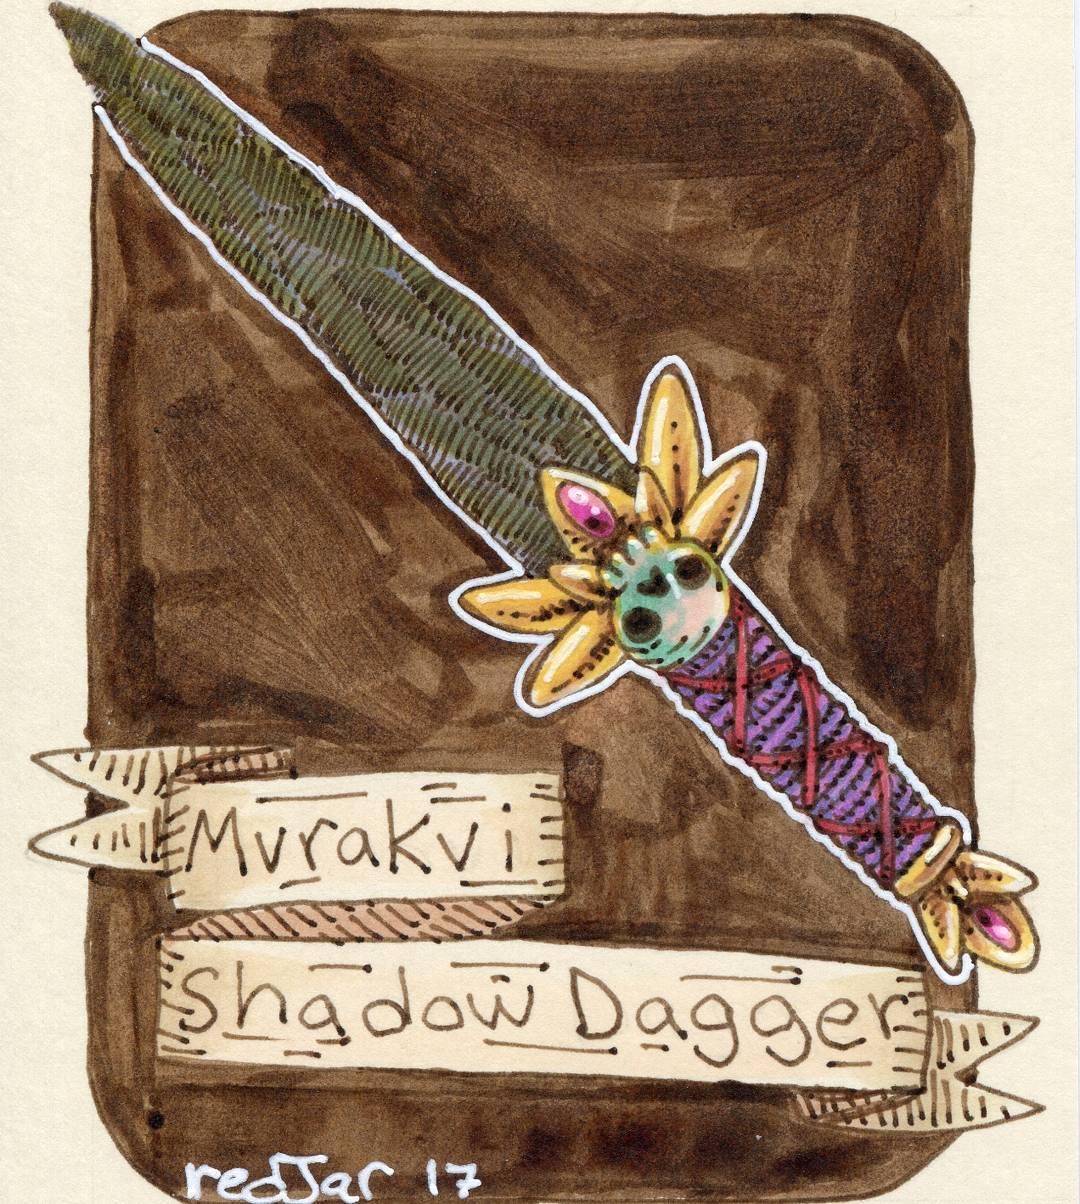 "redjarojam ""Mvrakvi Shadow Dagger"" - by Jared DeCosta (redjarojam) www.instagram.com/redjarojam (2017-04) © dell'autore tutti i diritti riservati"